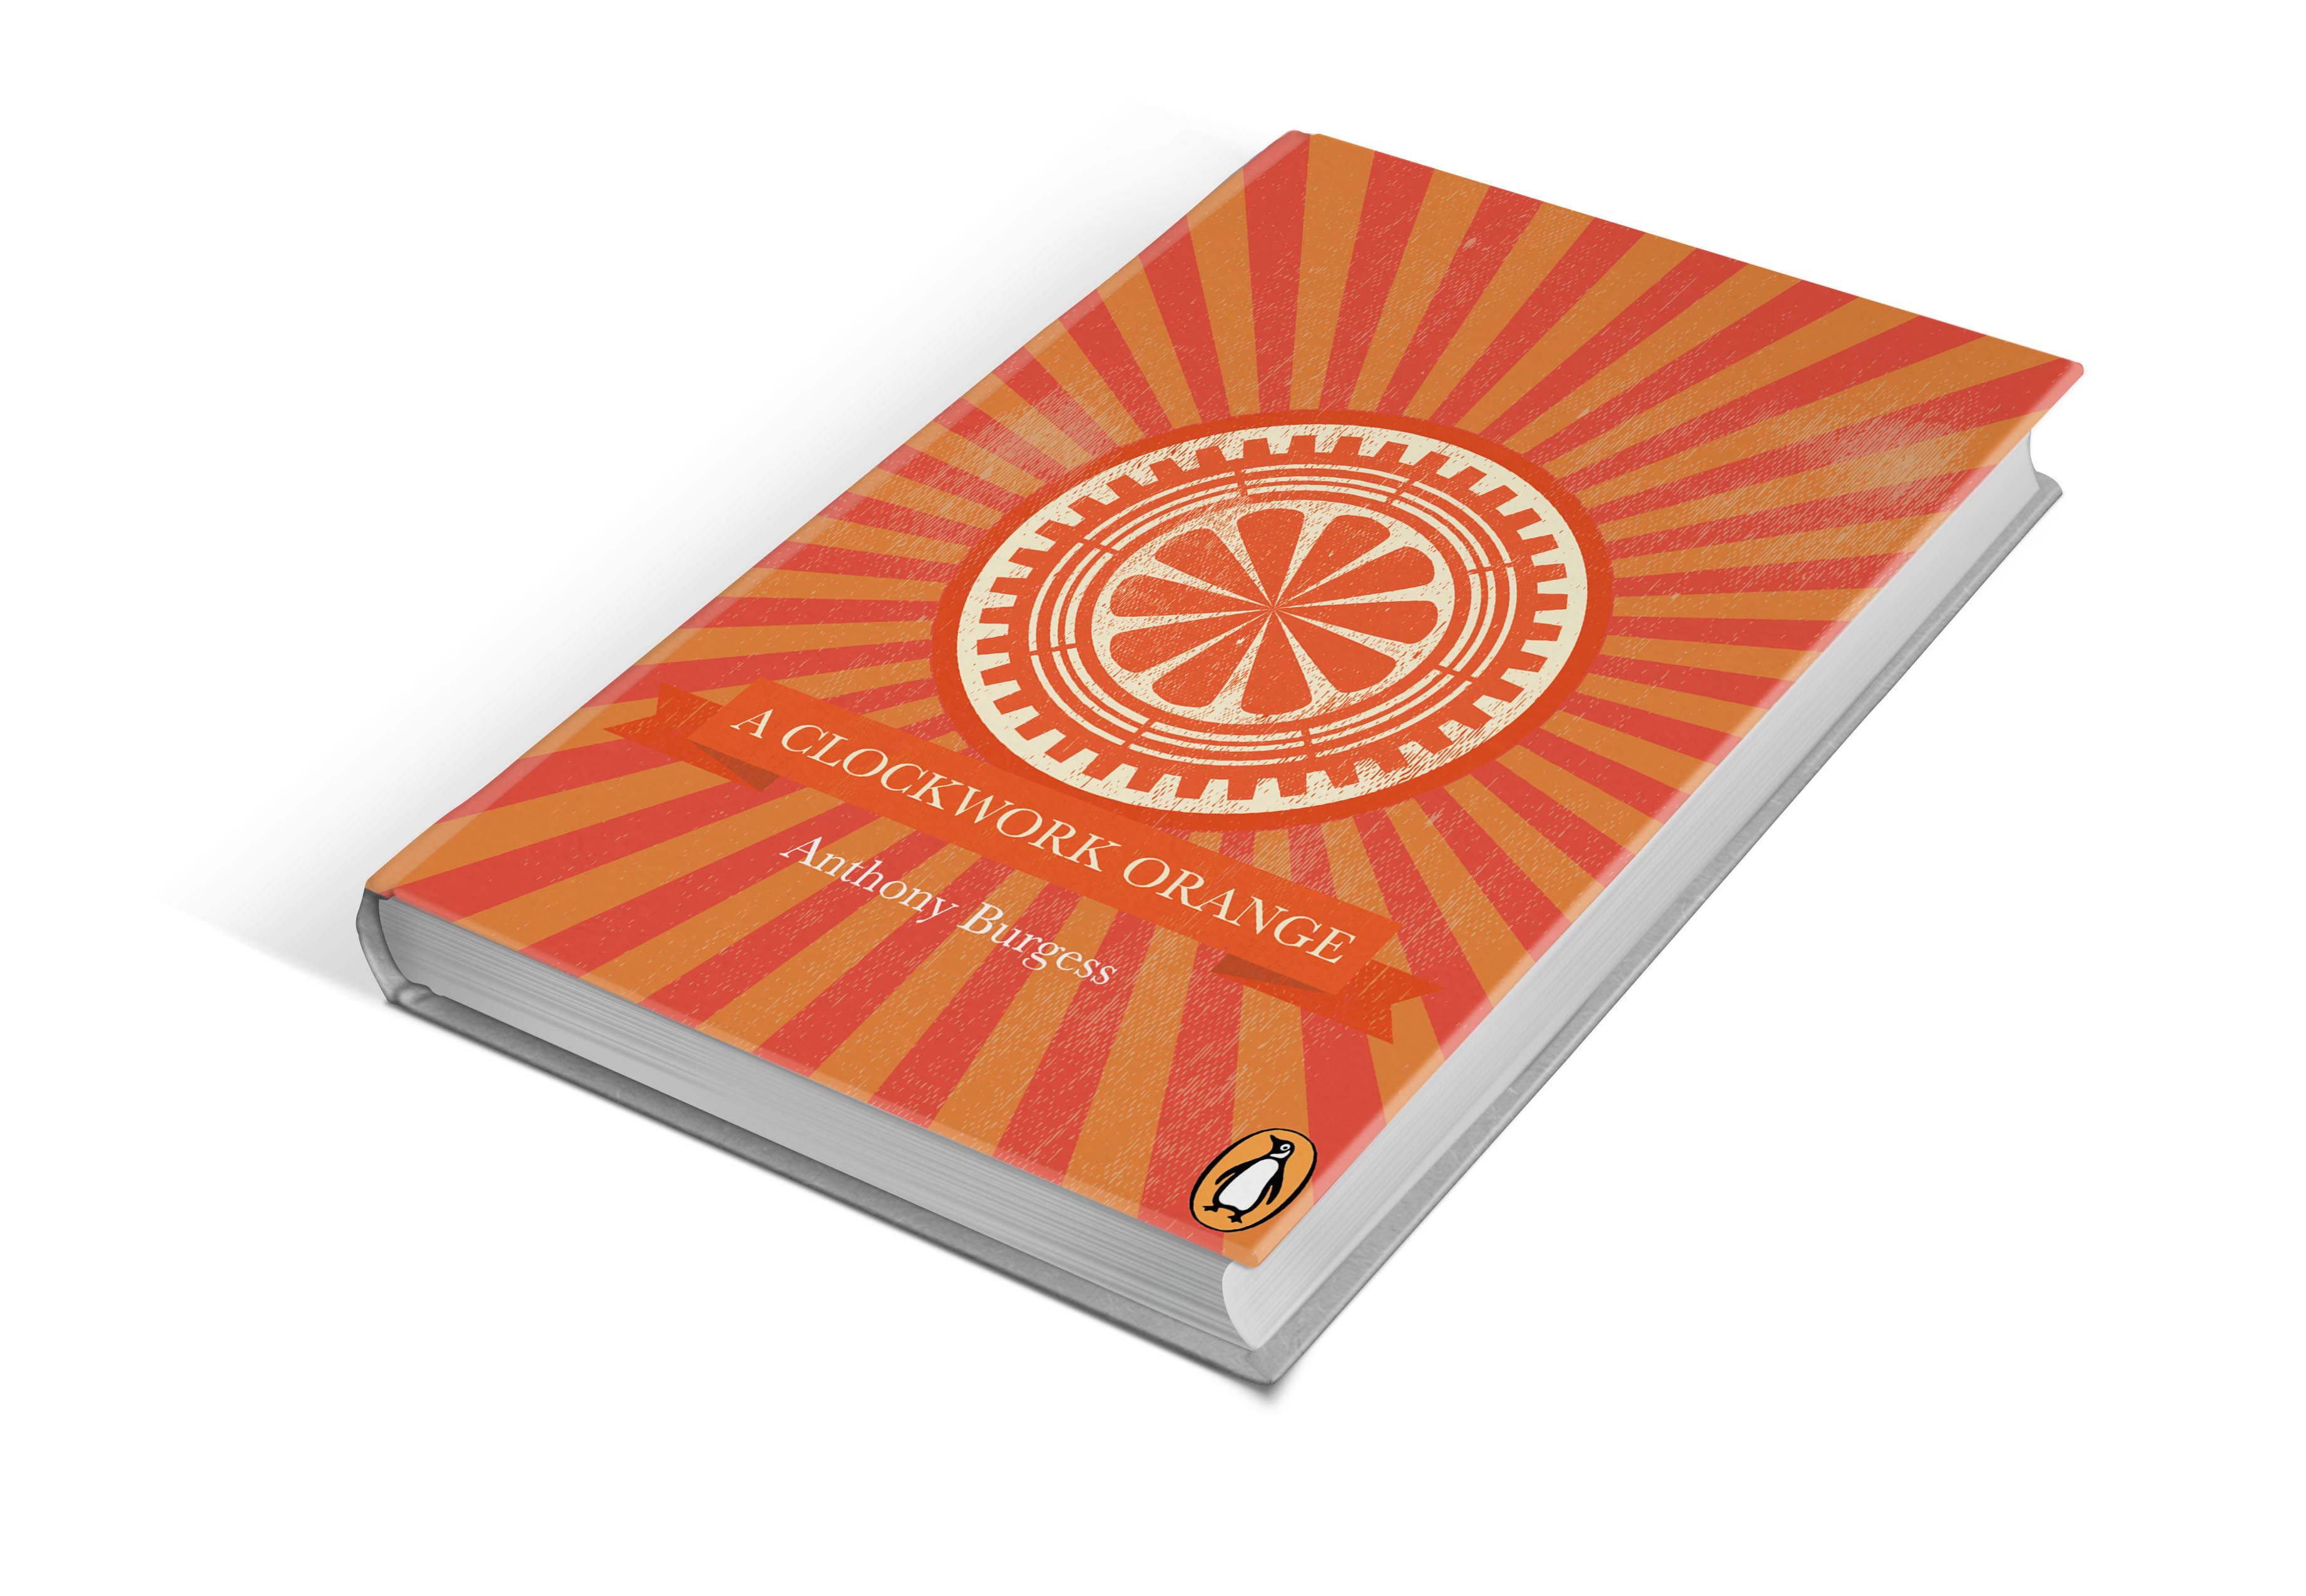 Global Poverty Essay A Clockwork Orange Book Design Branding On Cell Essay also Essay On Police Brutality A Clockwork Orange Essay Topics A Clockwork Orange Book Design  College Level Argumentative Essay Topics